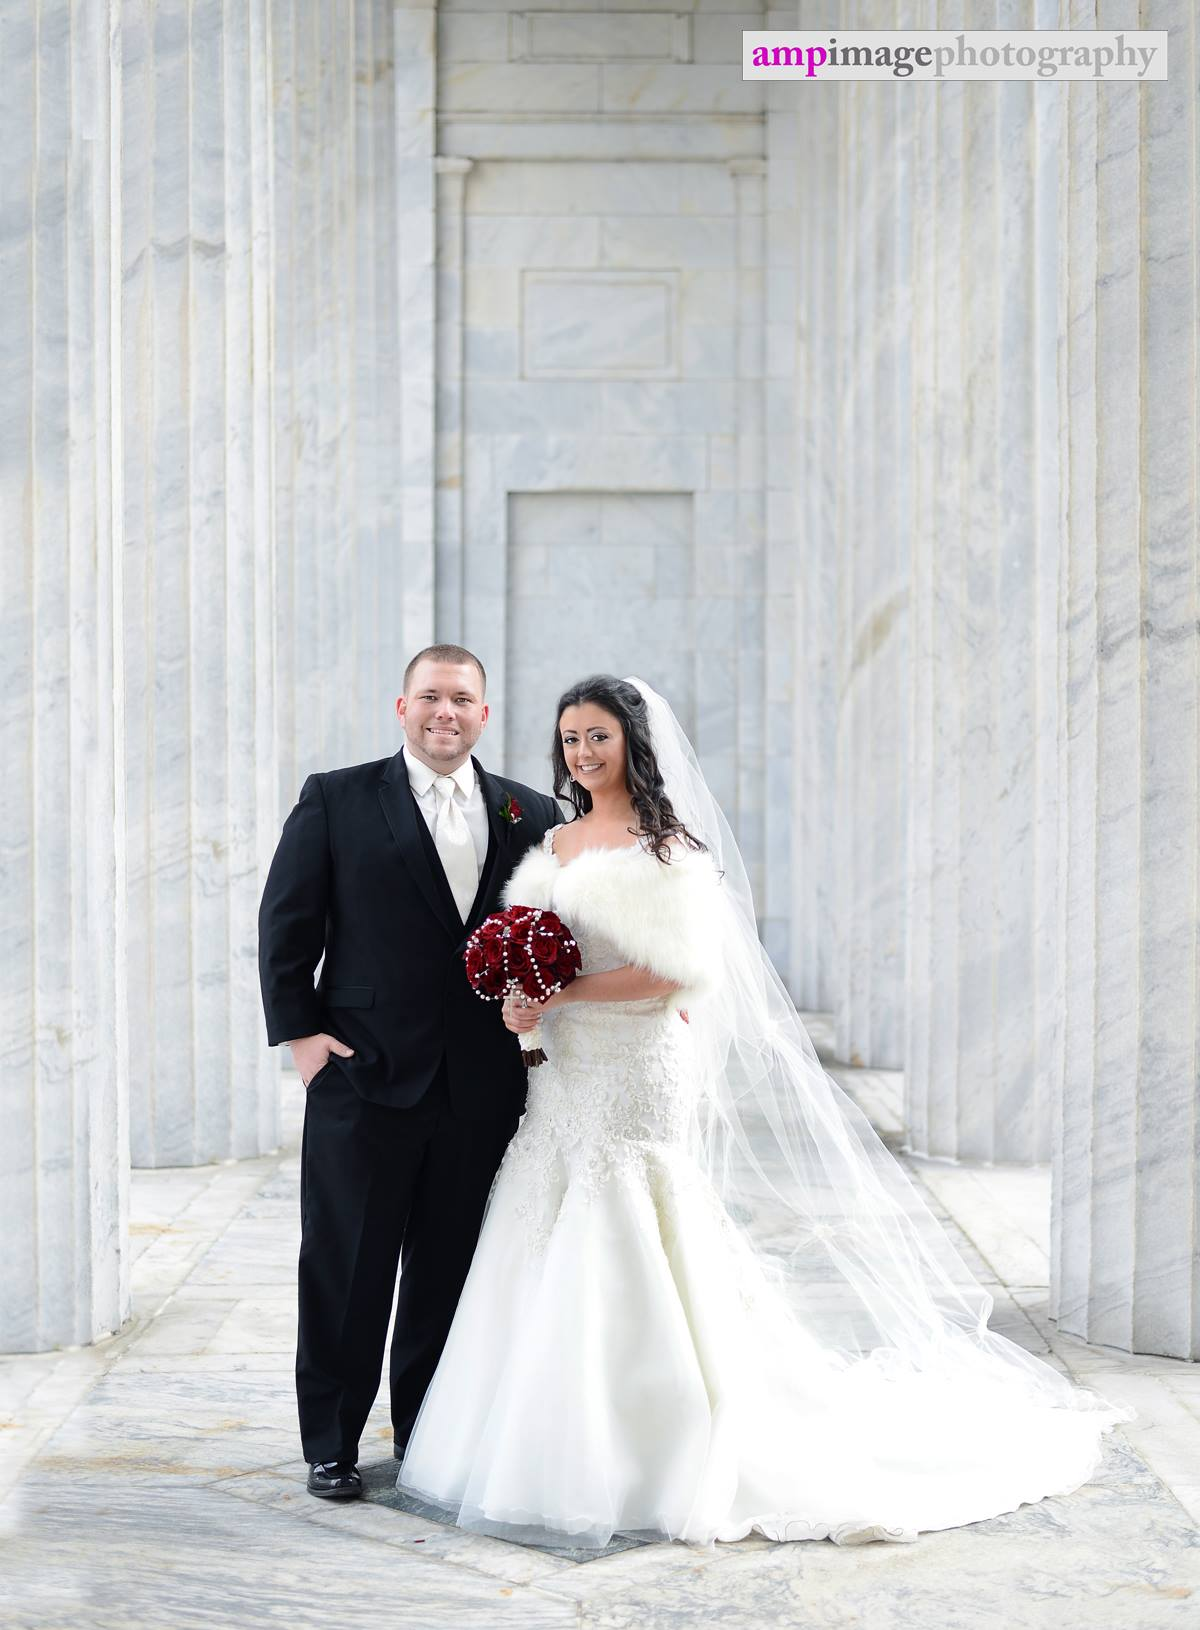 Jordyn & Dylan | Wedding | St. Stephen's Church | McKinley Memorial Library | The Avalon Inn | Youngstown Wedding Photography